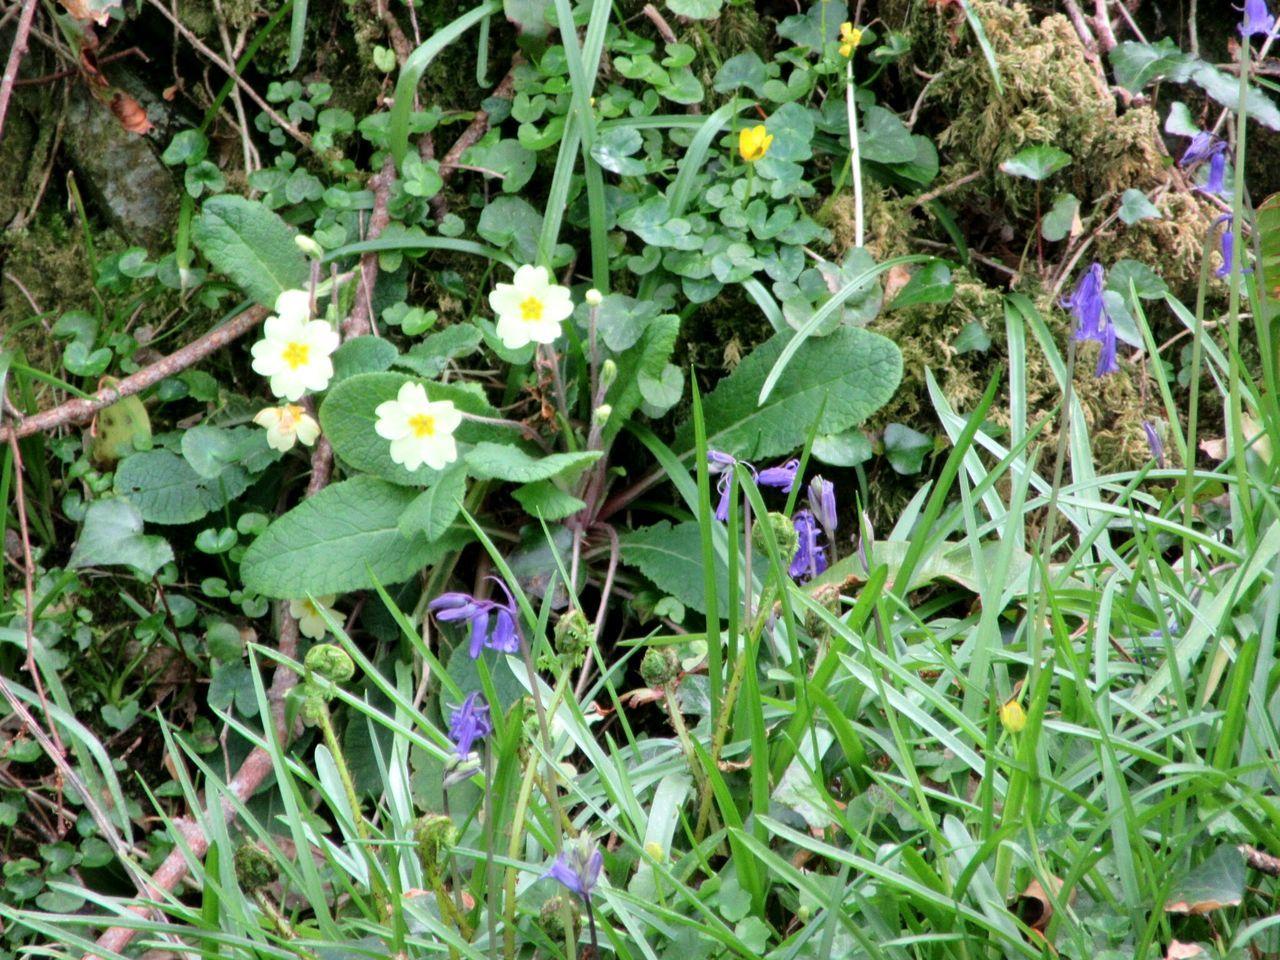 Spring flowers in the woods Spring Flowers Primrose Bluebells Moss WoodLand Mizen Peninsula West Cork Wildatlanticway Ireland